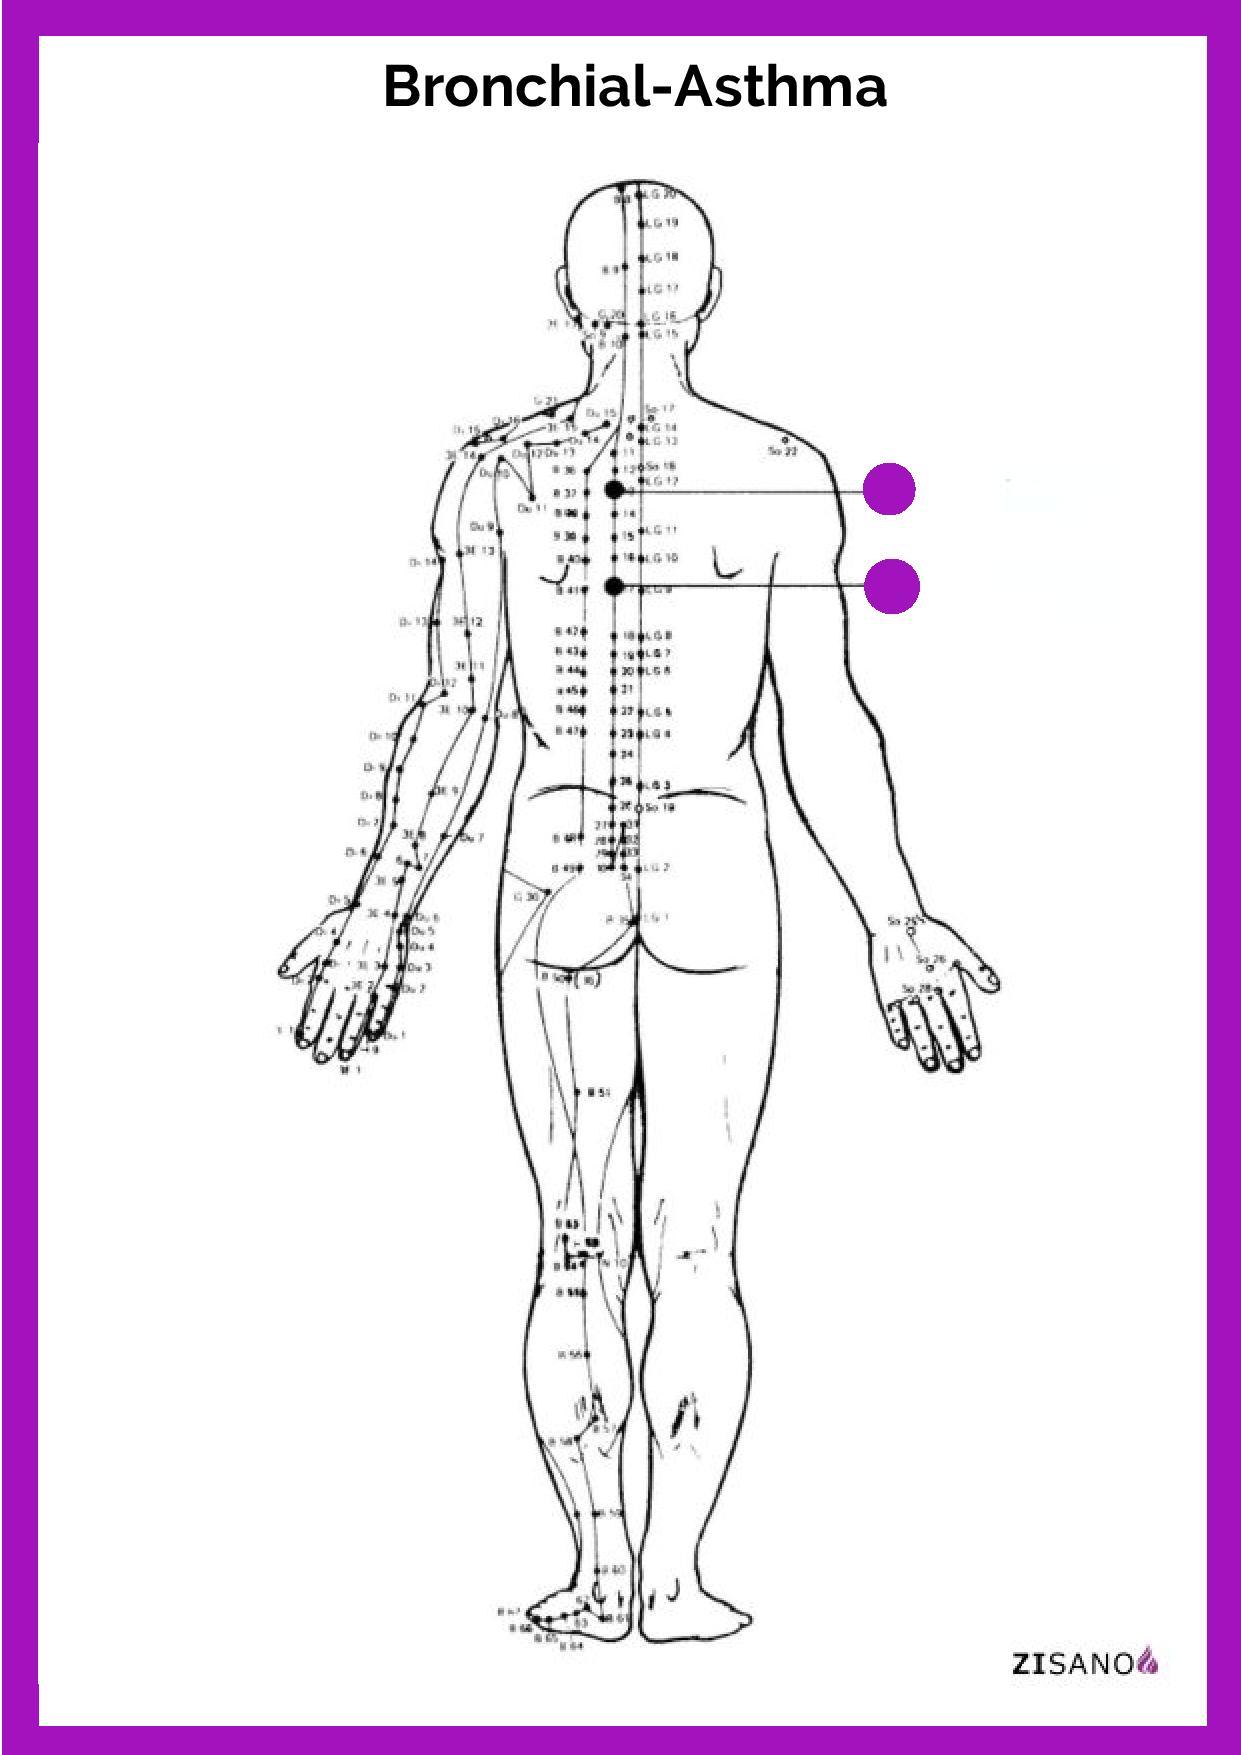 Meridiane - Bronchial-Asthma - Behandlung